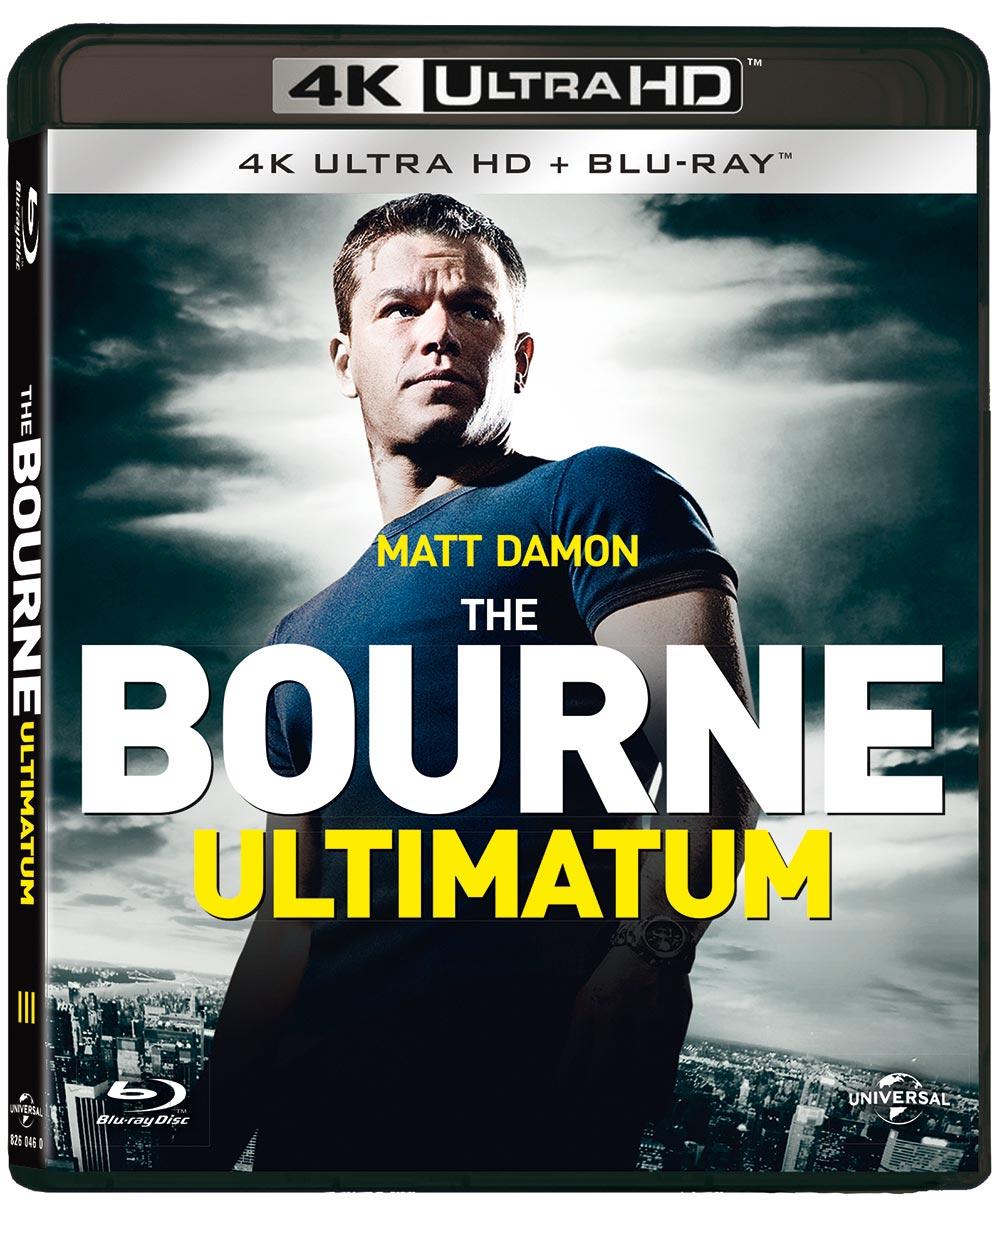 THE BOURNE ULTIMATUM (BLU-RAY 4K ULTRA HD+BLU-RAY)